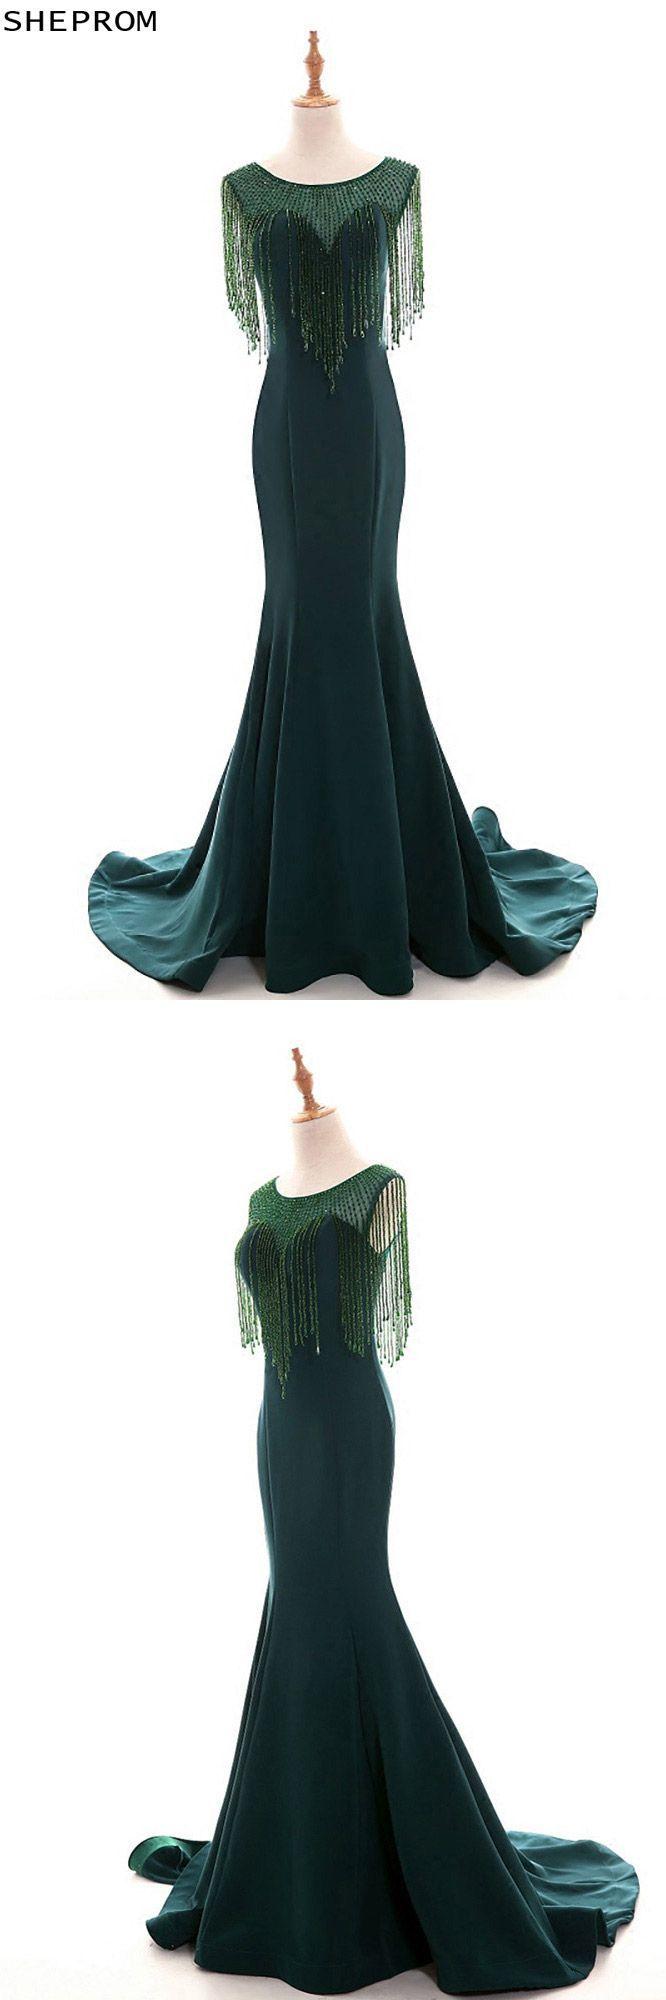 Classy dark green long mermaid formal evening dress with bling